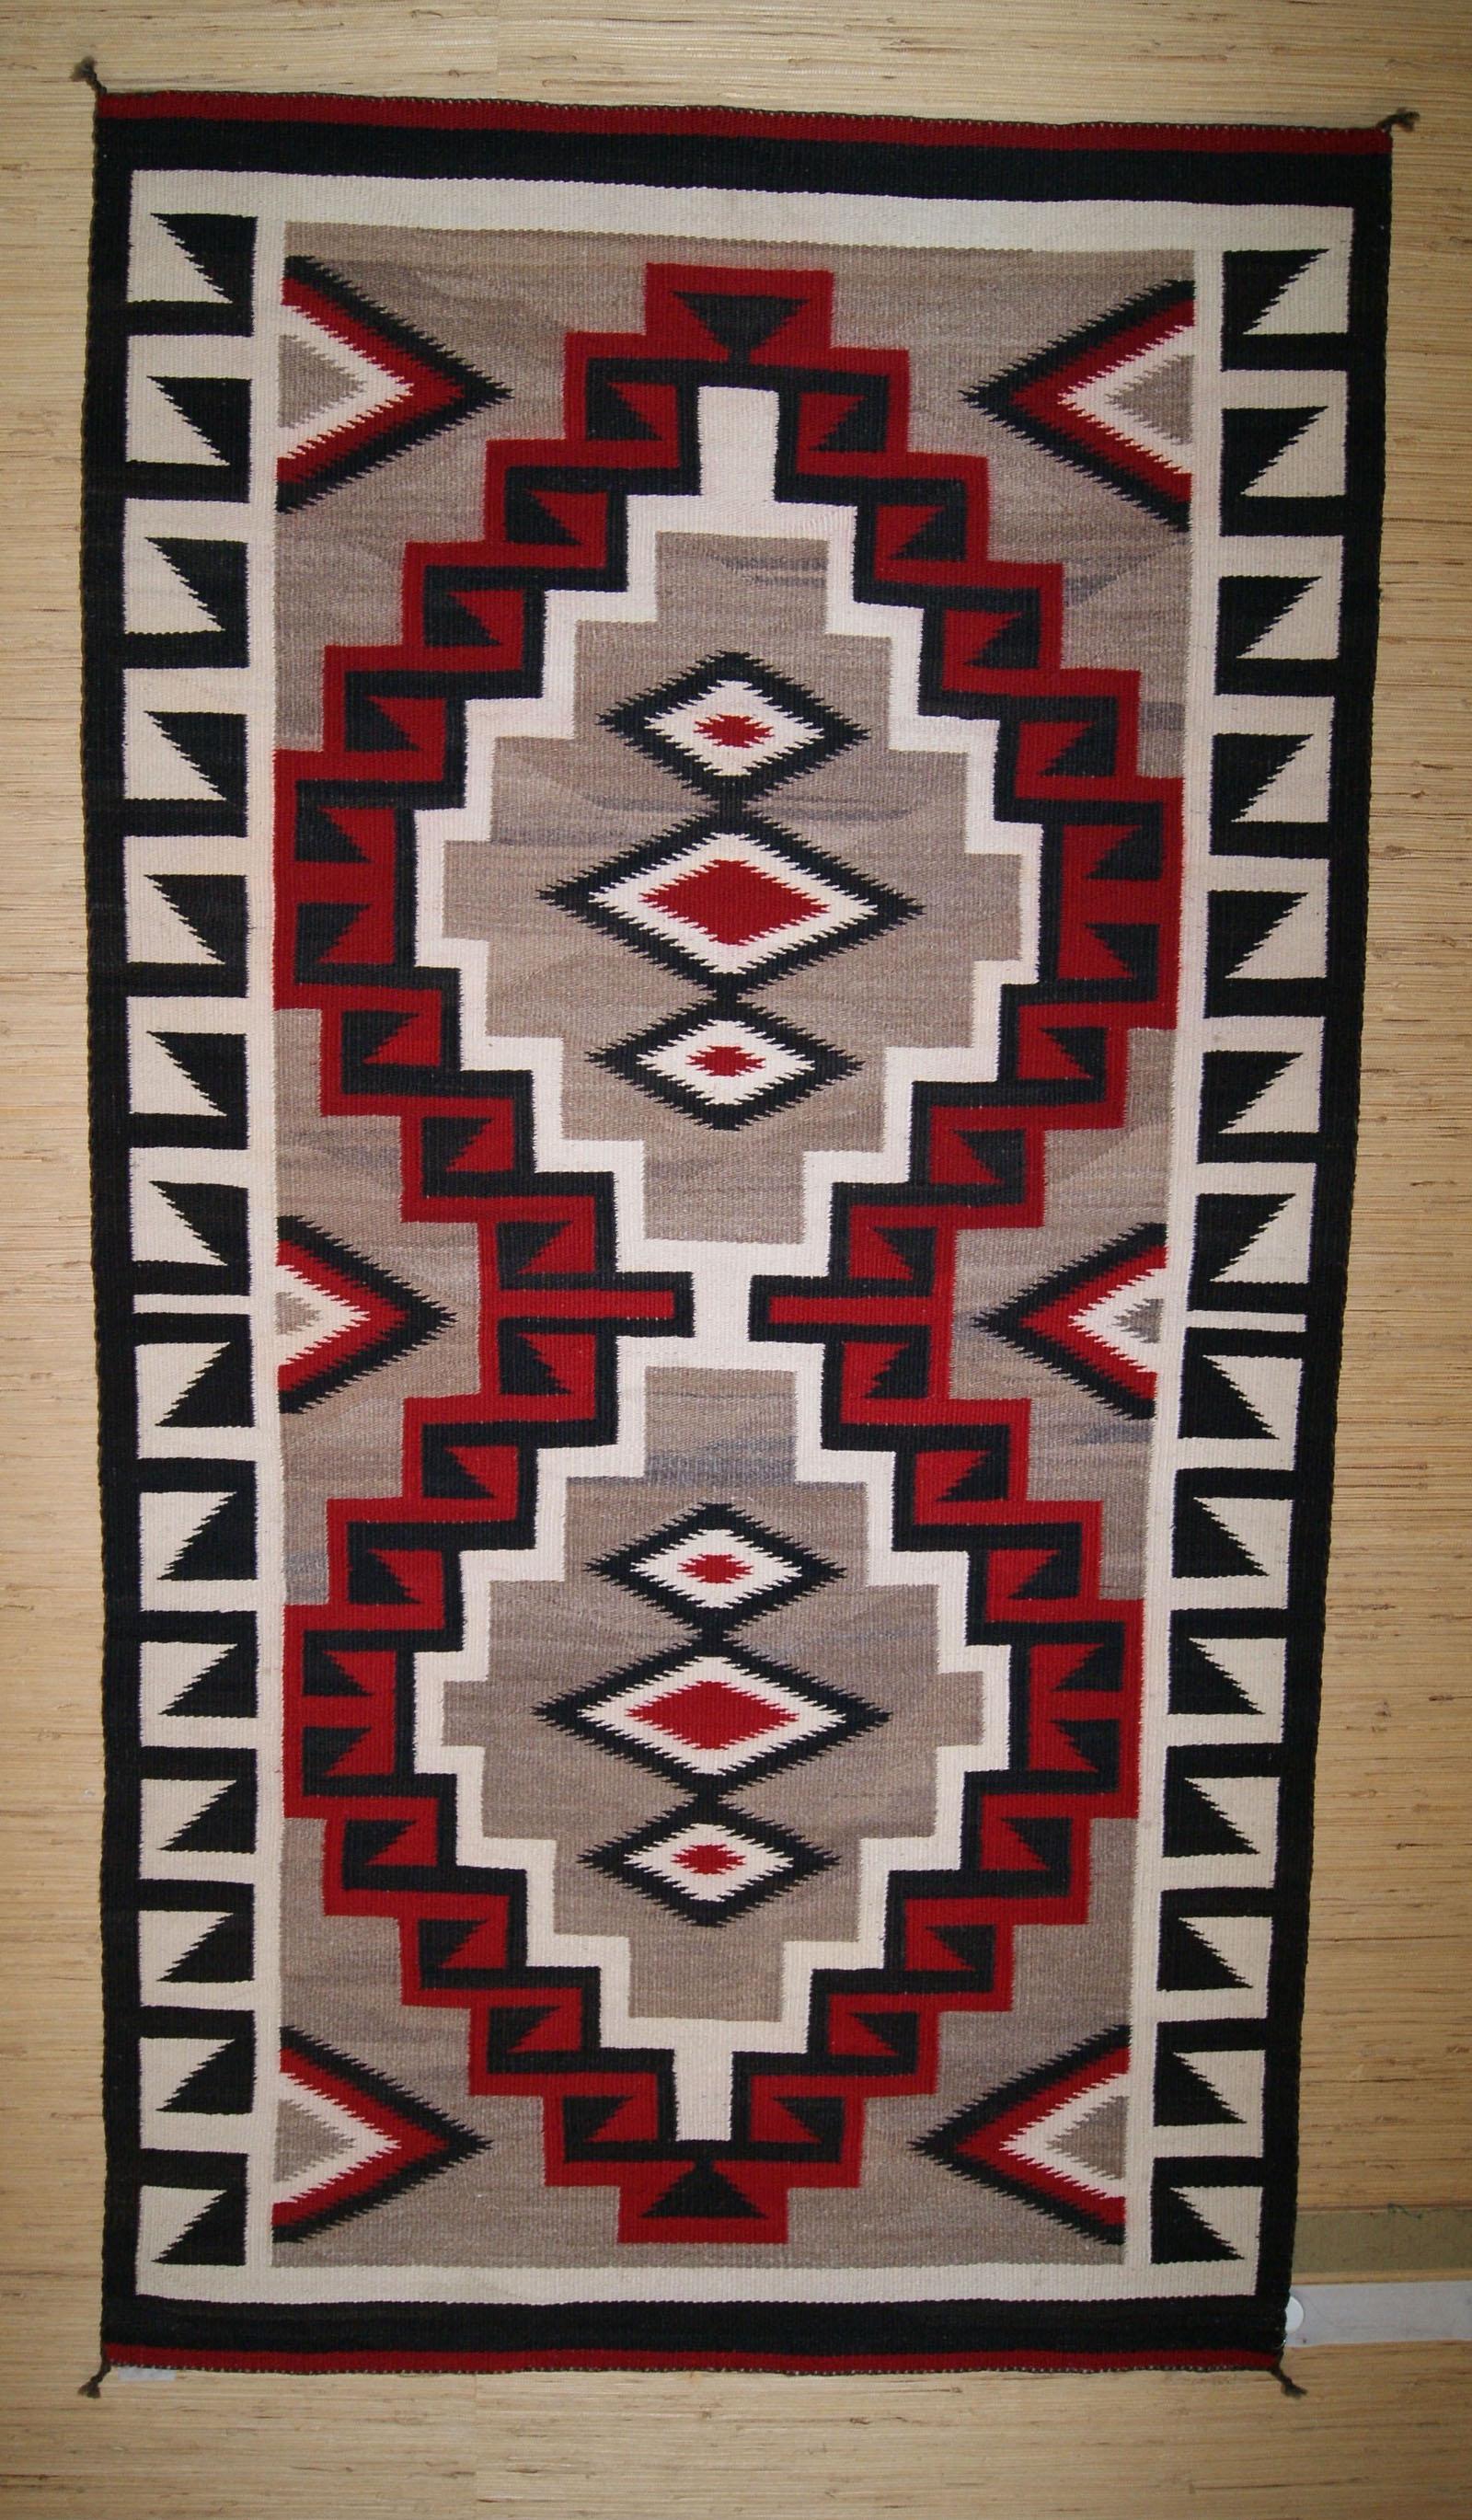 Navajo Rug Designs Navajo Rug Patterns And Symbols Designs Brint